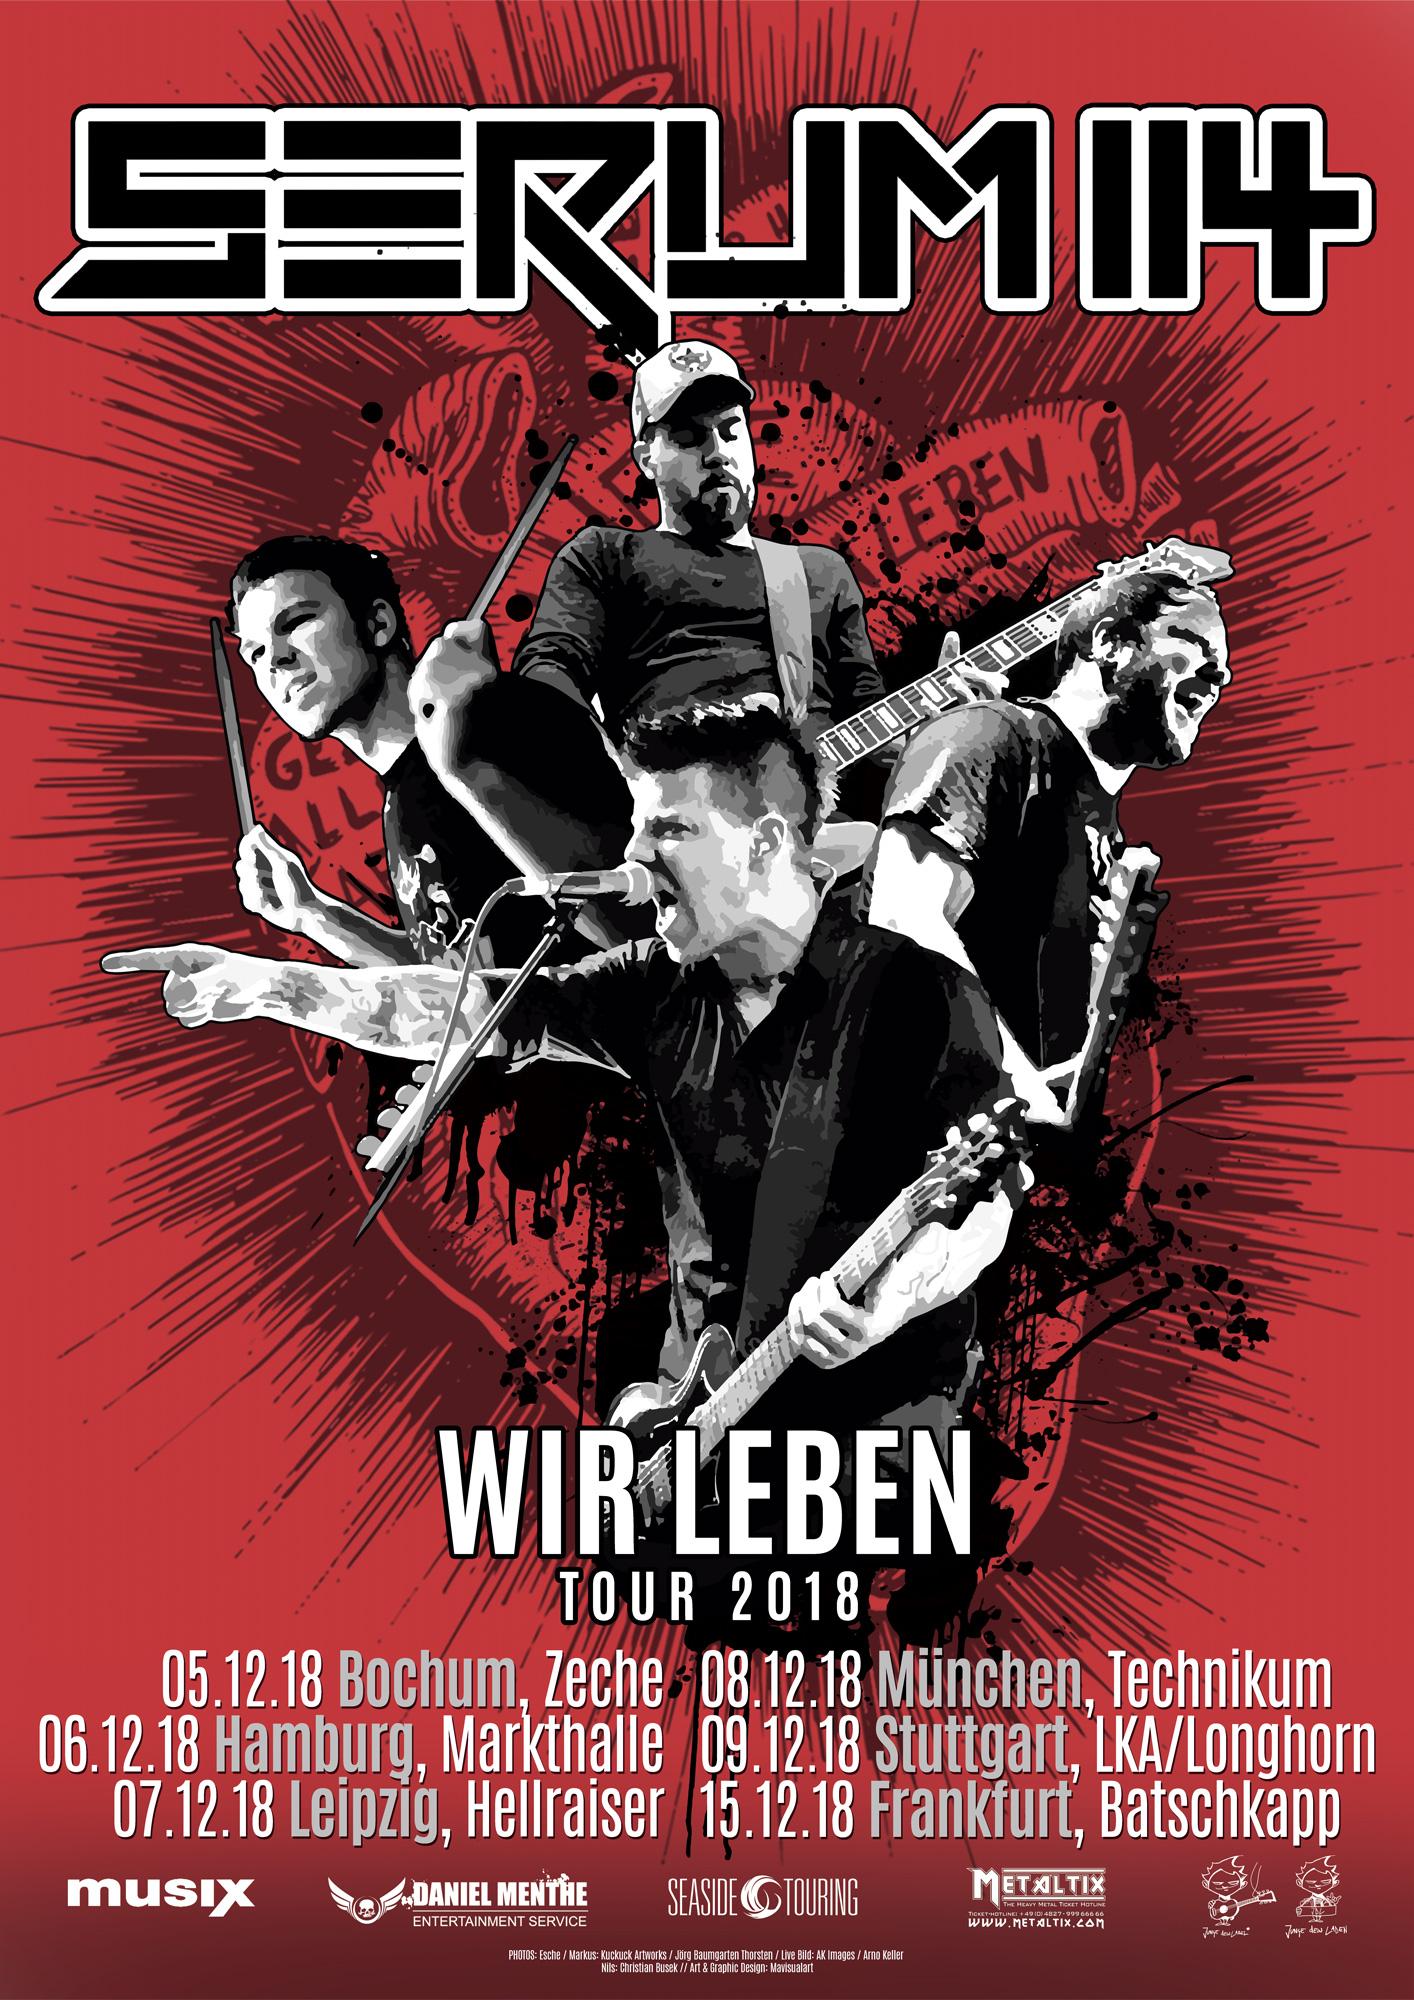 Preview: Serum 114 Wir leben Tour 2018